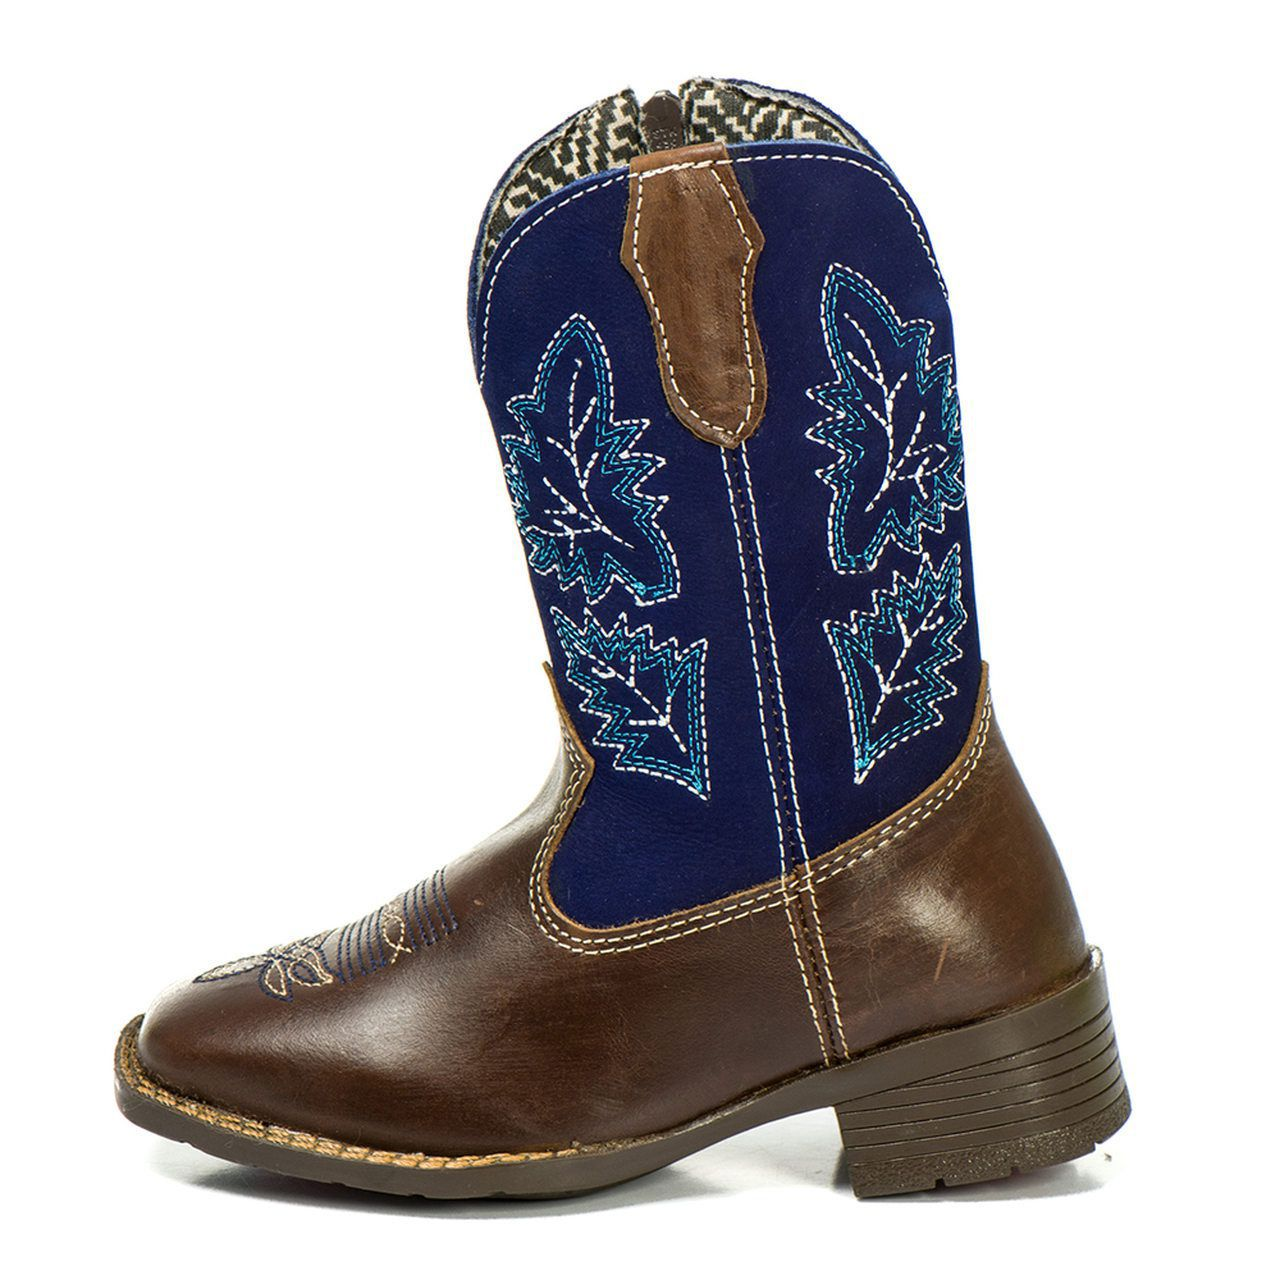 Bota Country Kapell Texana Infantil Azul Masculina Menino